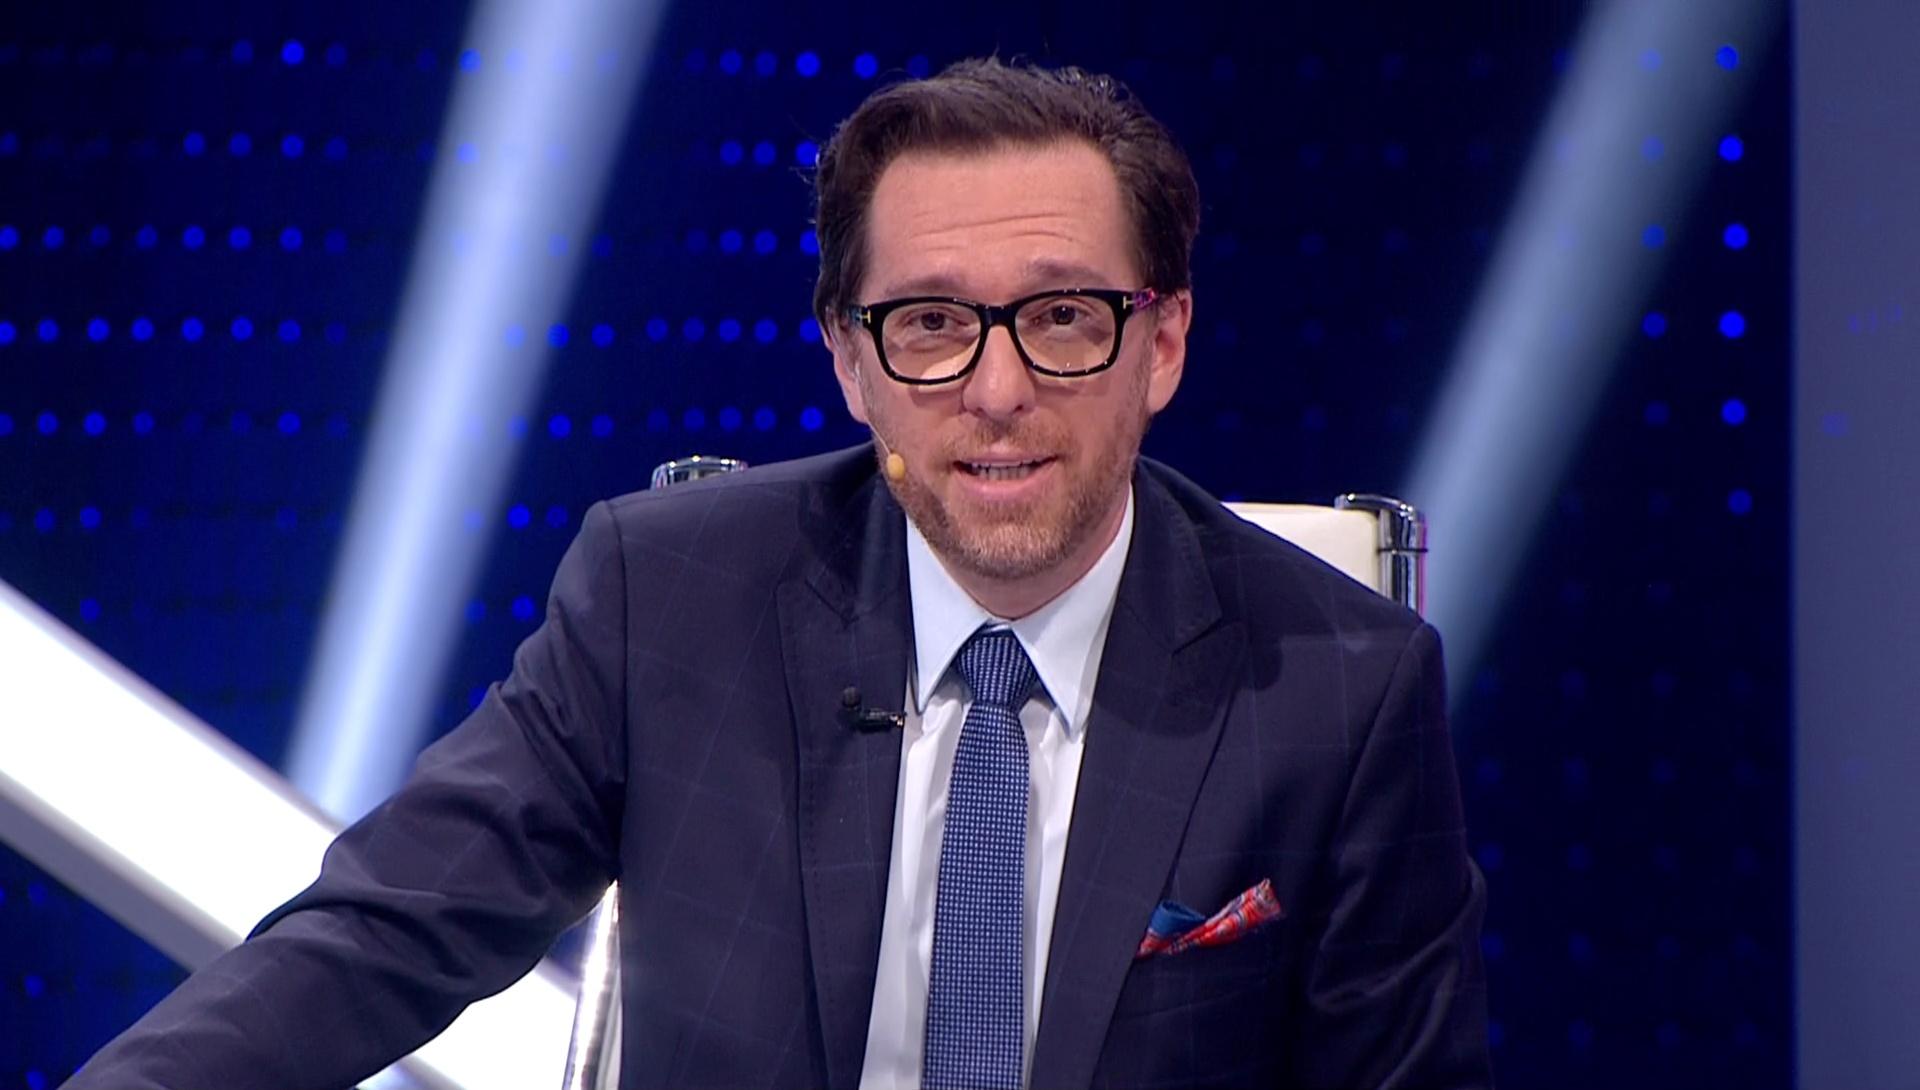 Maciej Jabłoński, fot. TVP